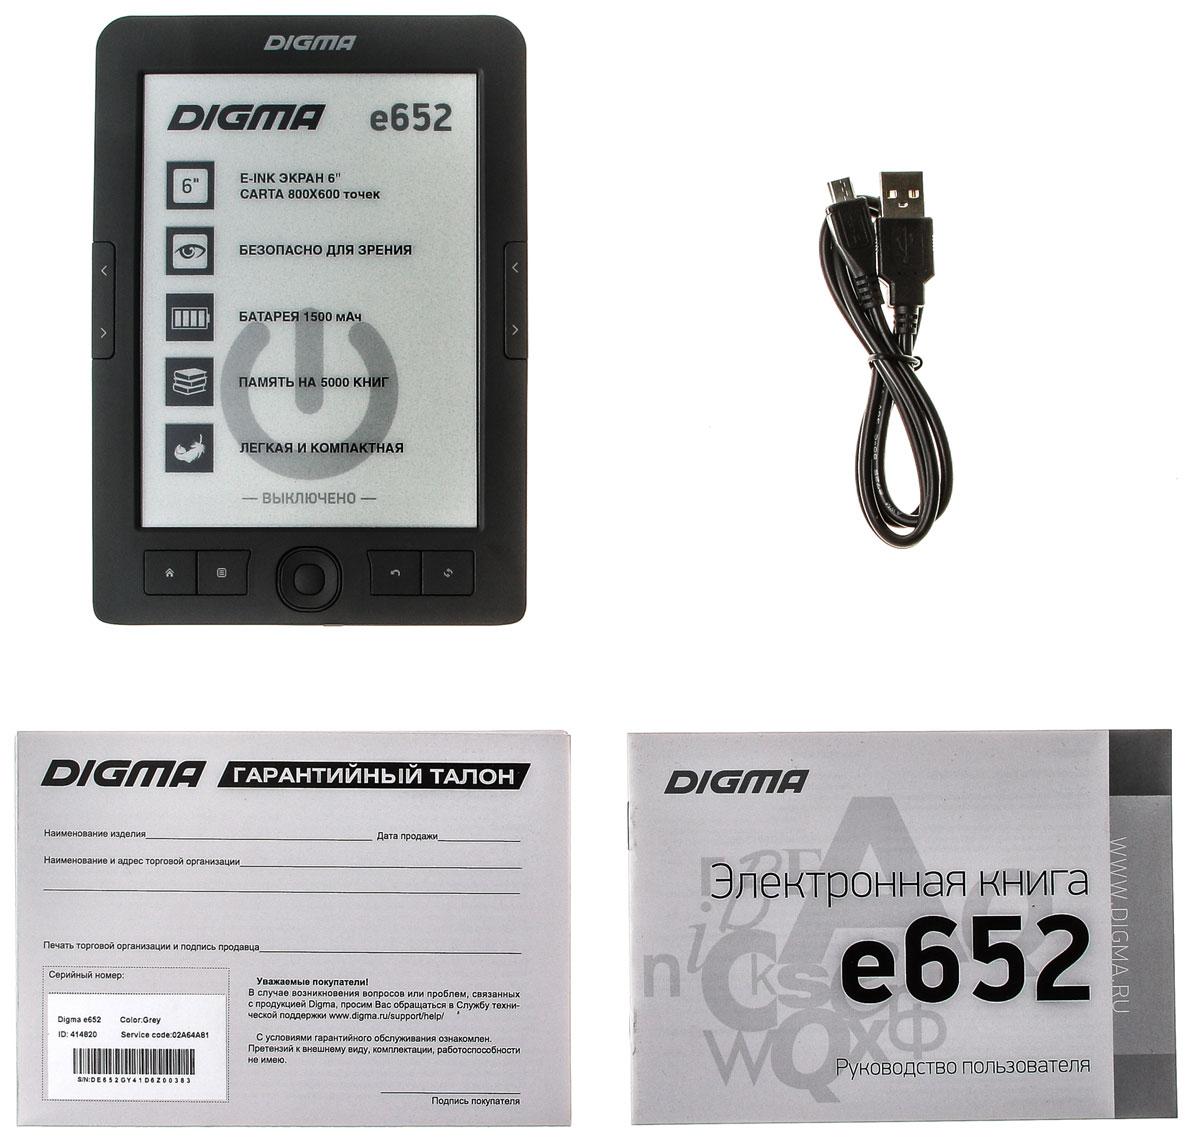 Digma E652, Grayэлектронная книга Digma